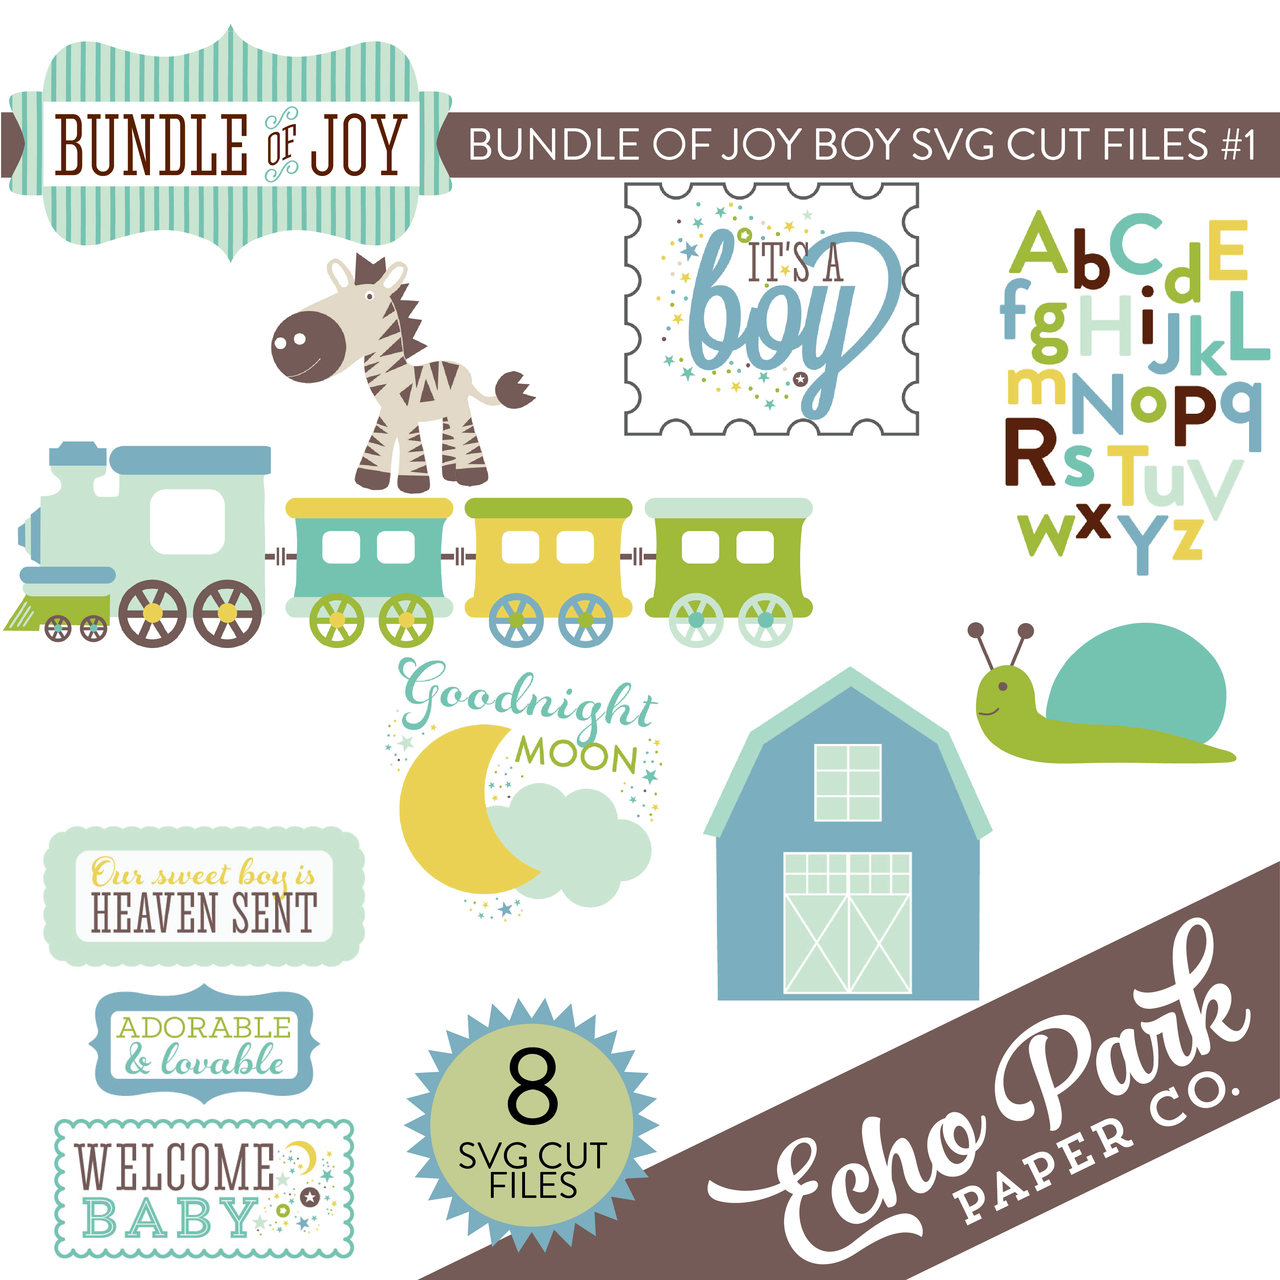 Bundle of Joy - Boy SVG Cut Files #1